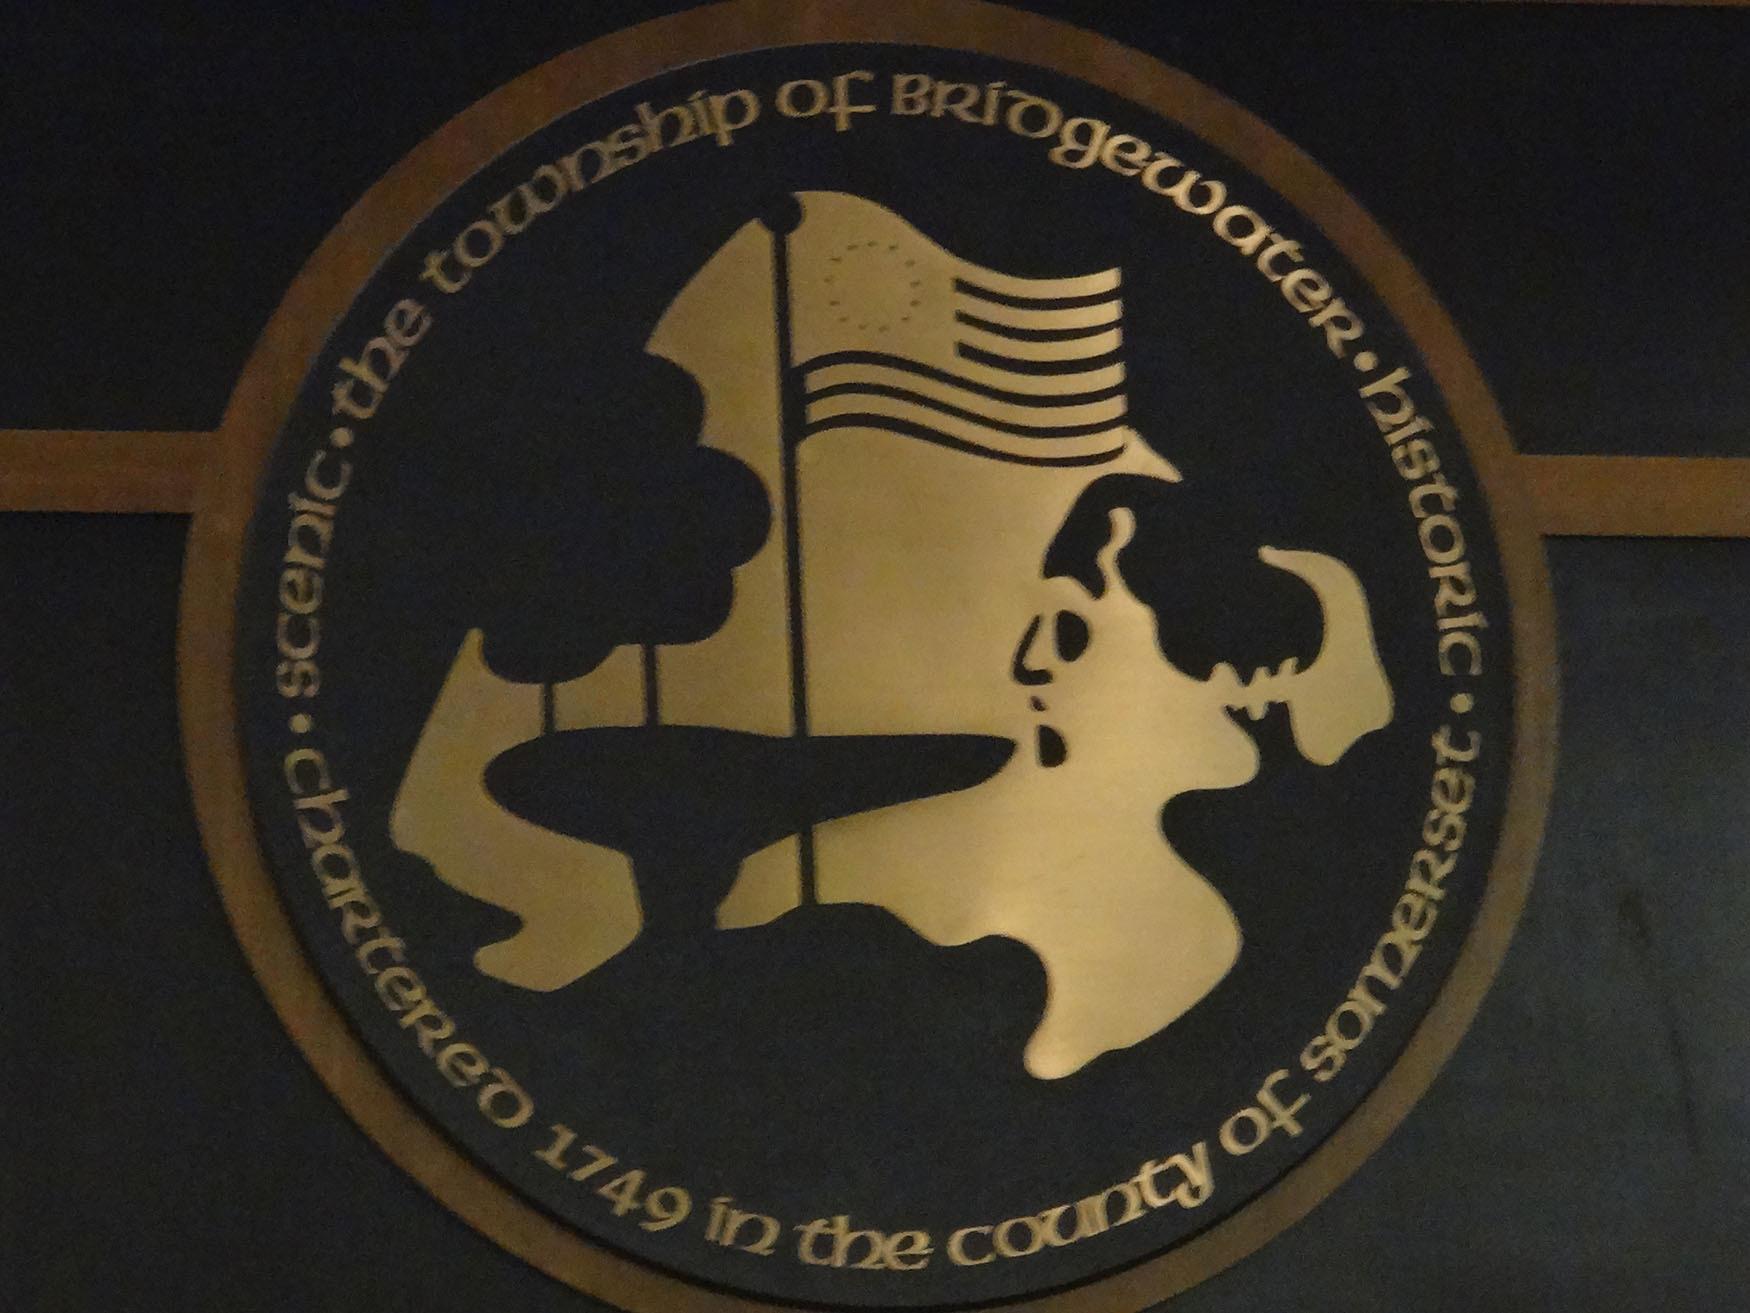 1413c09c4a6d030bb8fb_Bridgewater_symbol.jpg